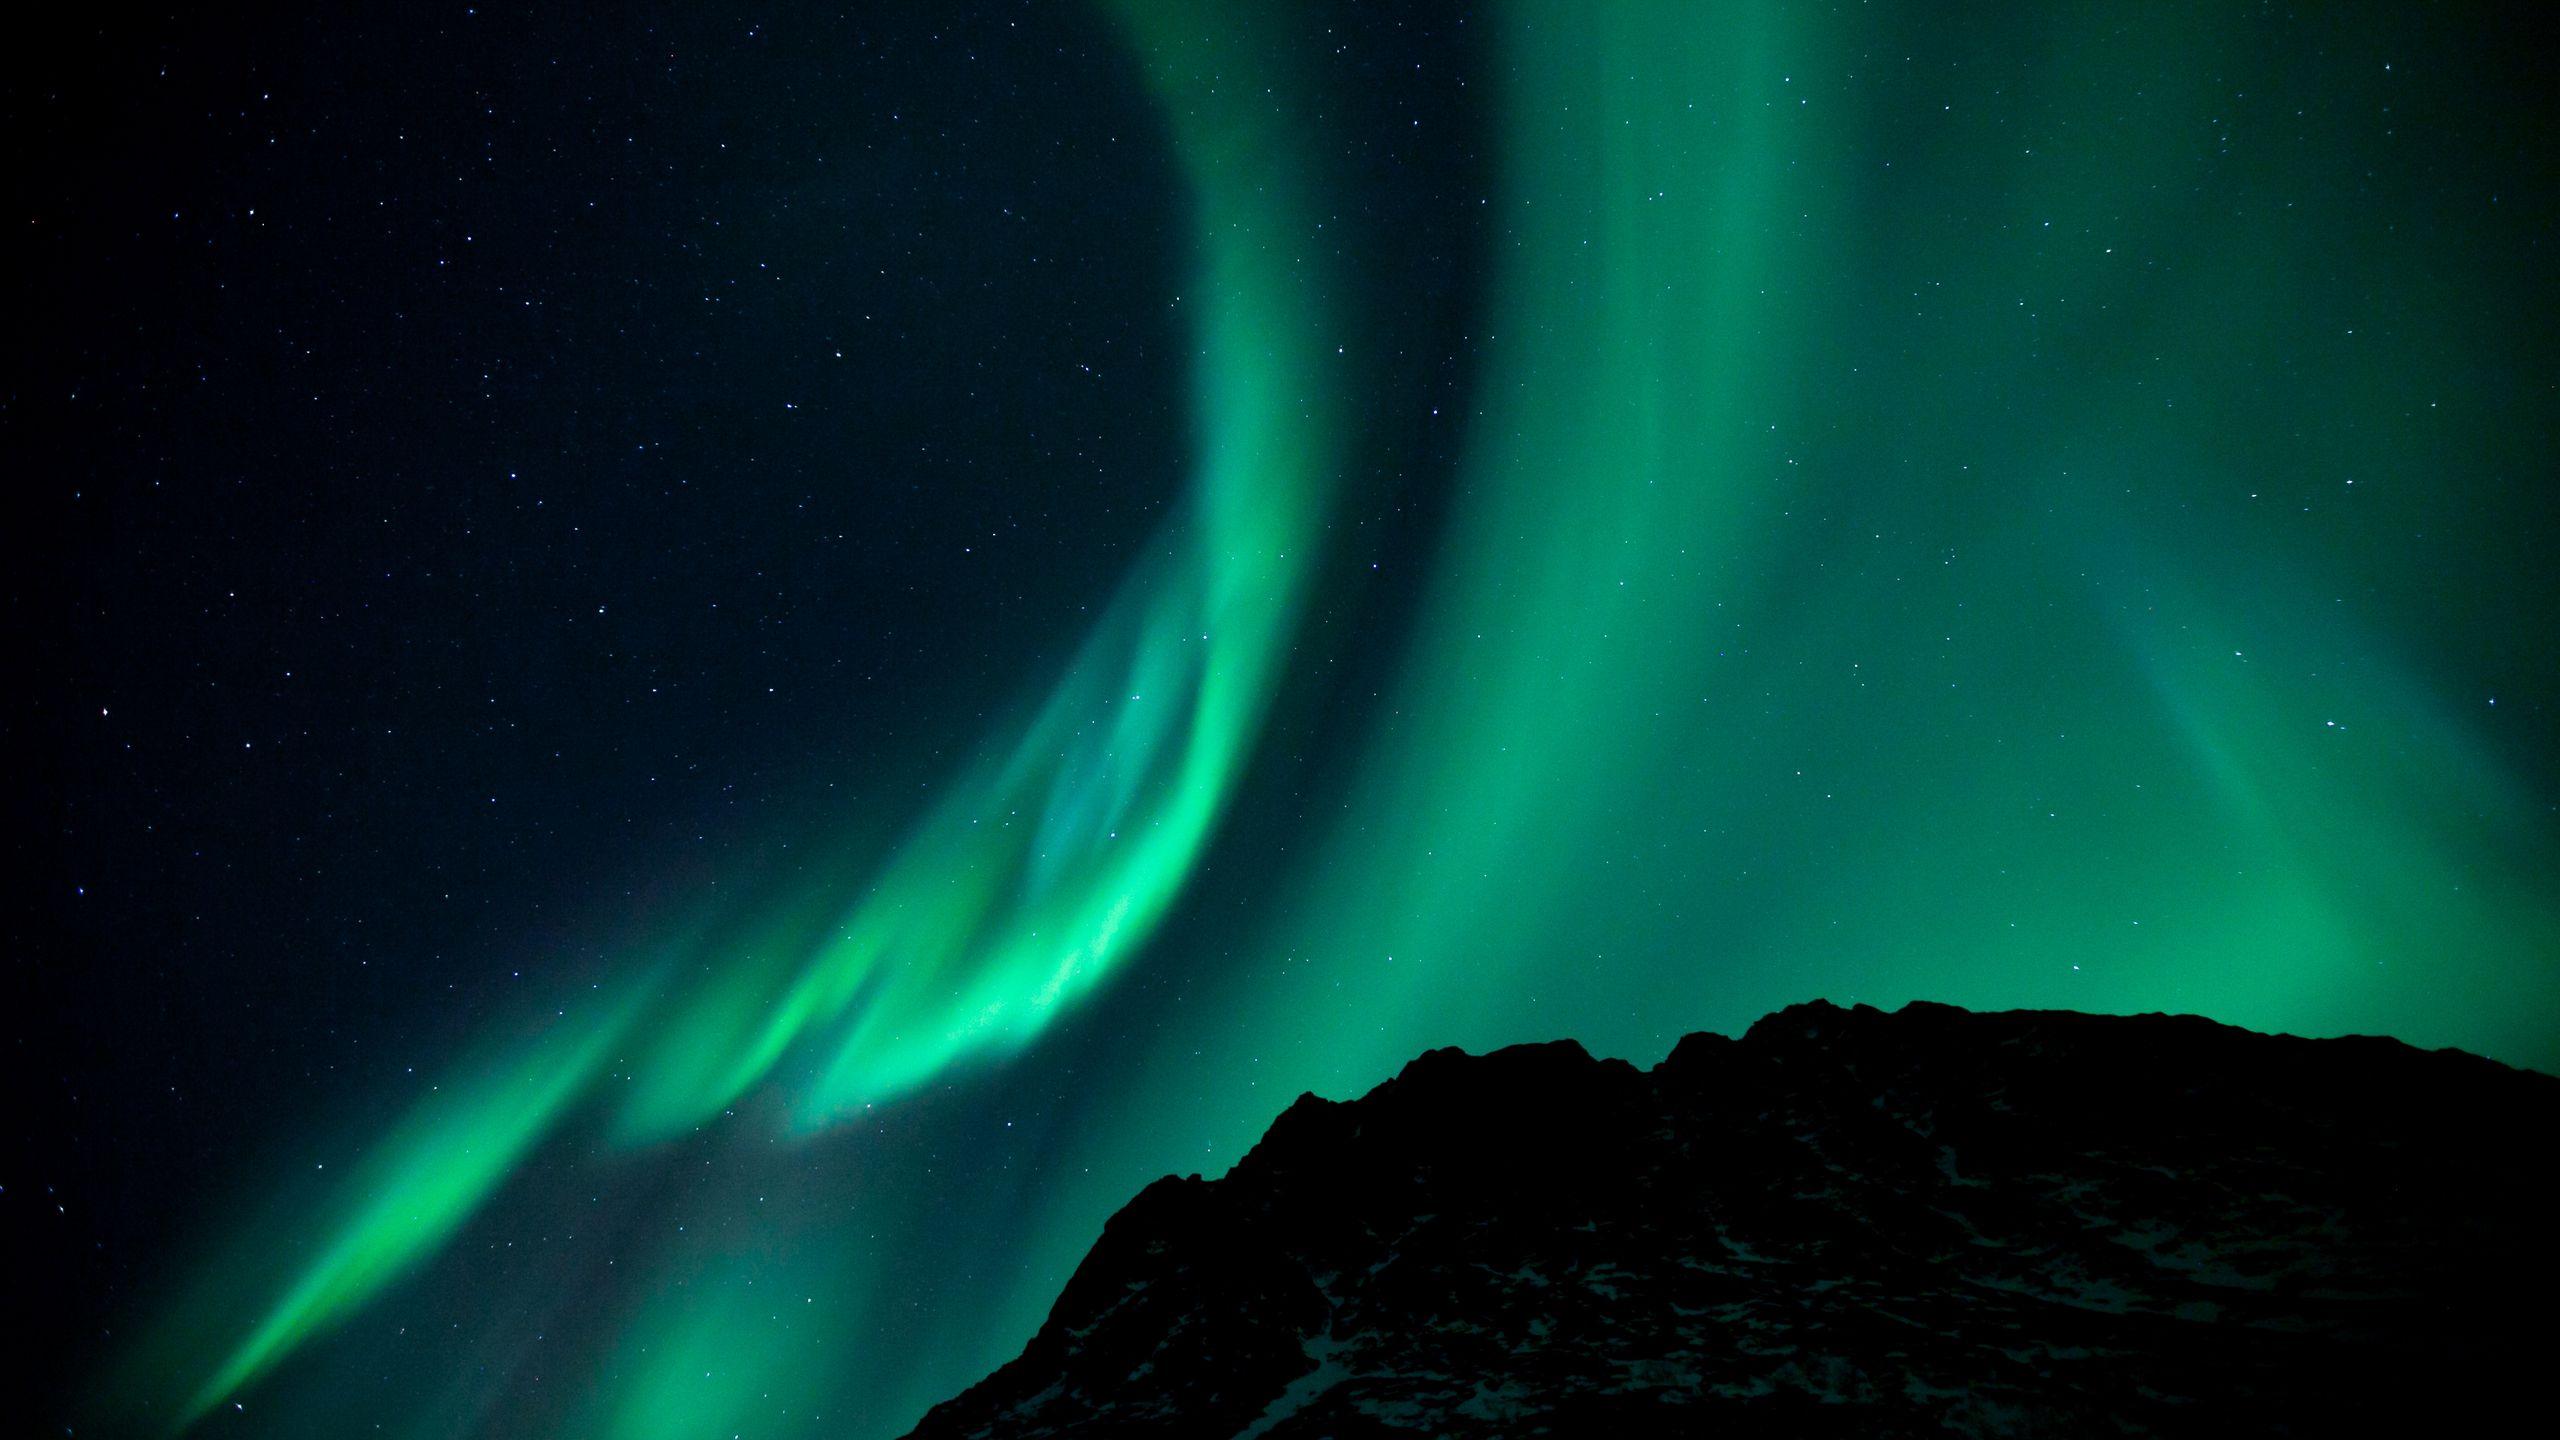 2560x1440 Wallpaper northern lights, night, night sky, phenomenon